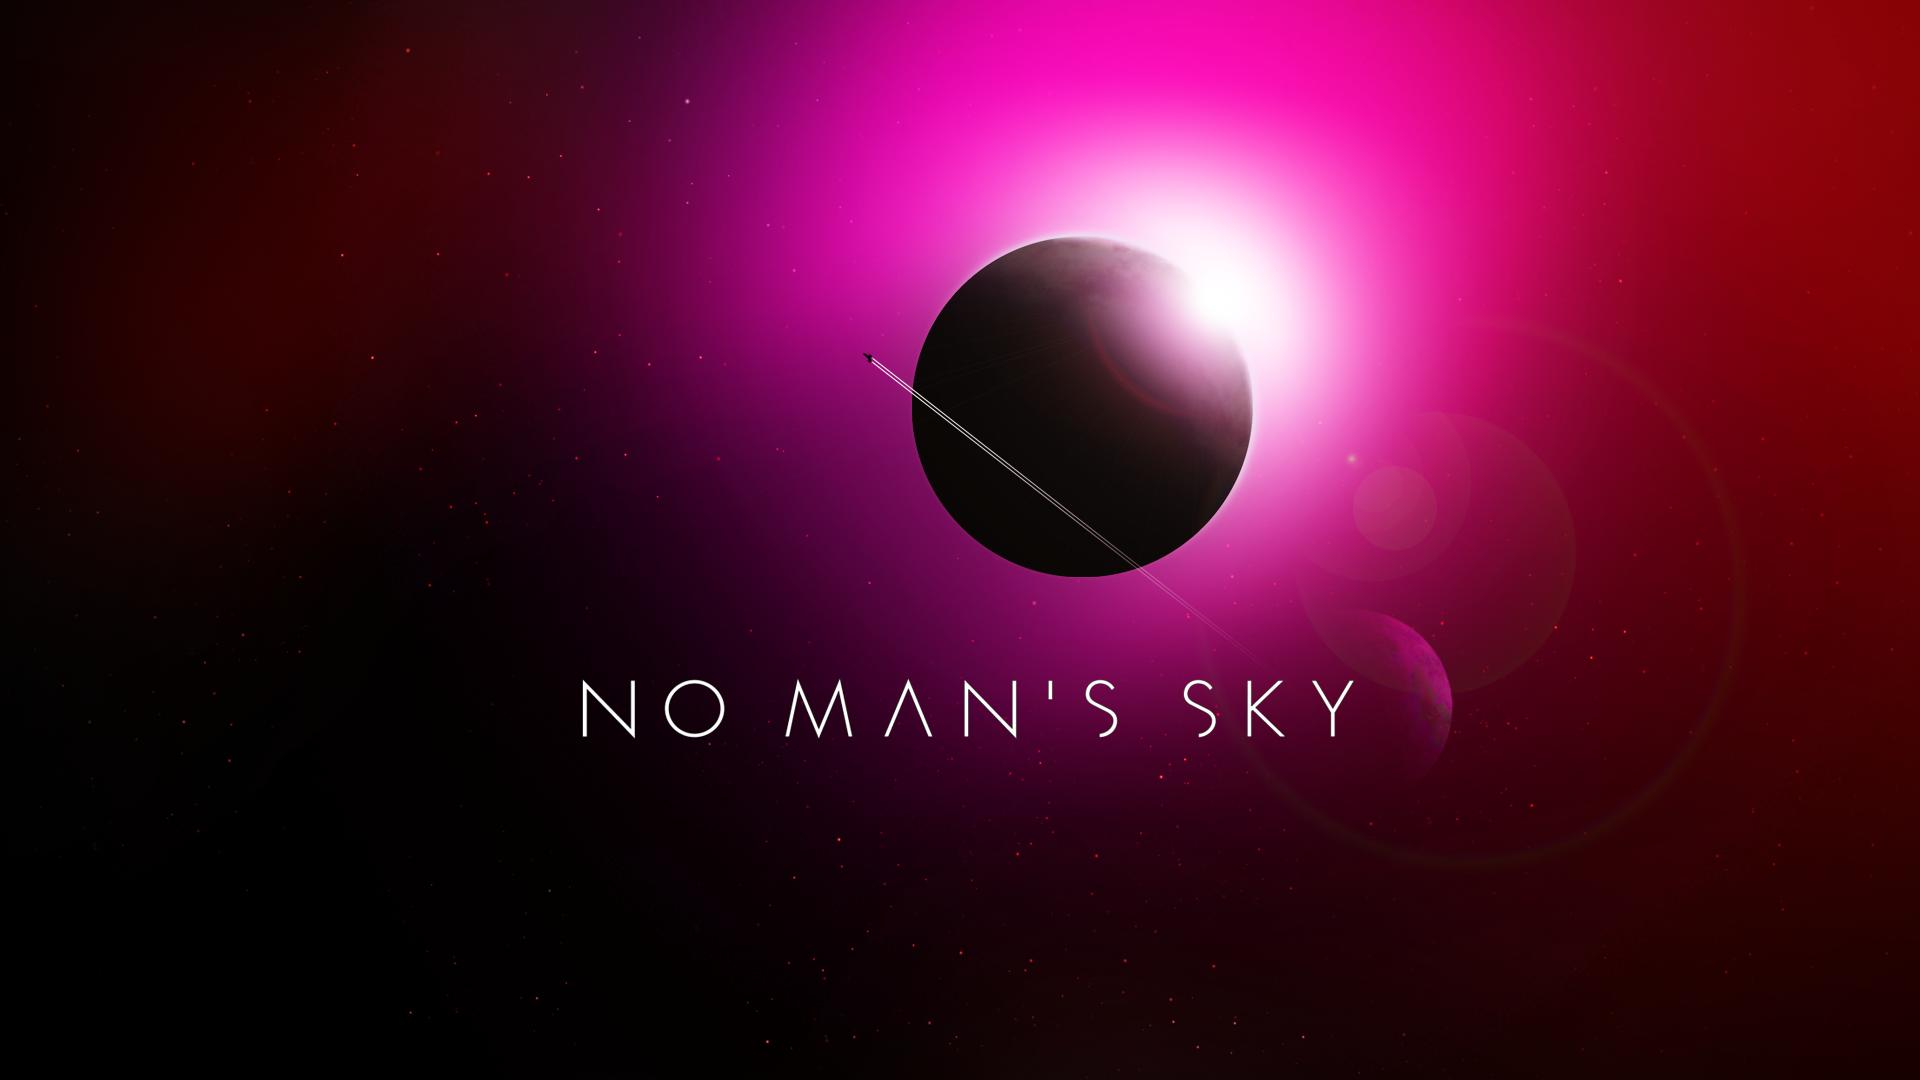 No Man's Sky Wallpaper by RockLou